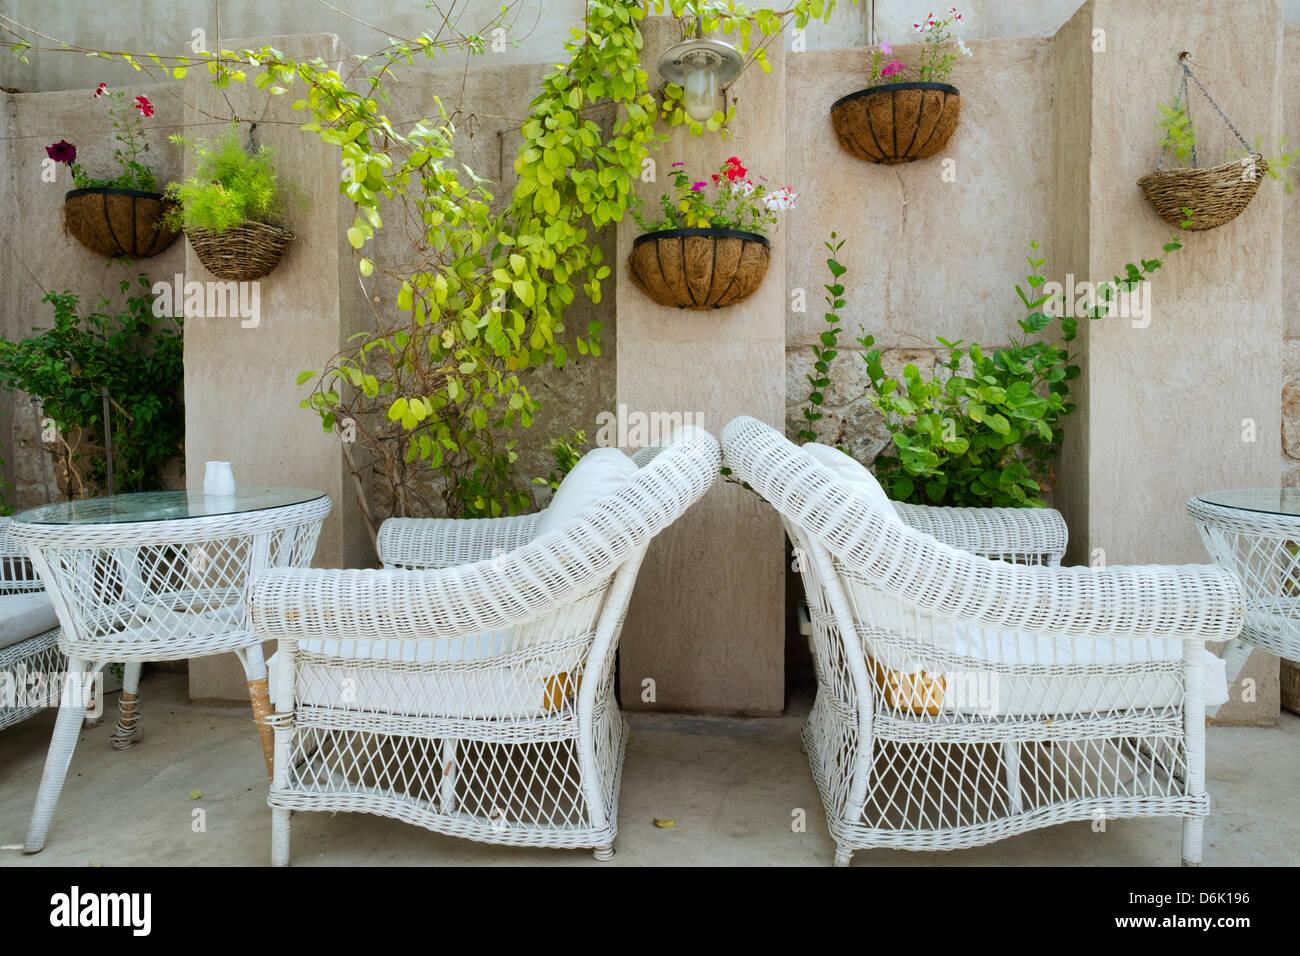 Outdoor courtyard cafe detail in historical Al Bastakiya old district in Bur Dubai United Arab Emirates - Stock Image